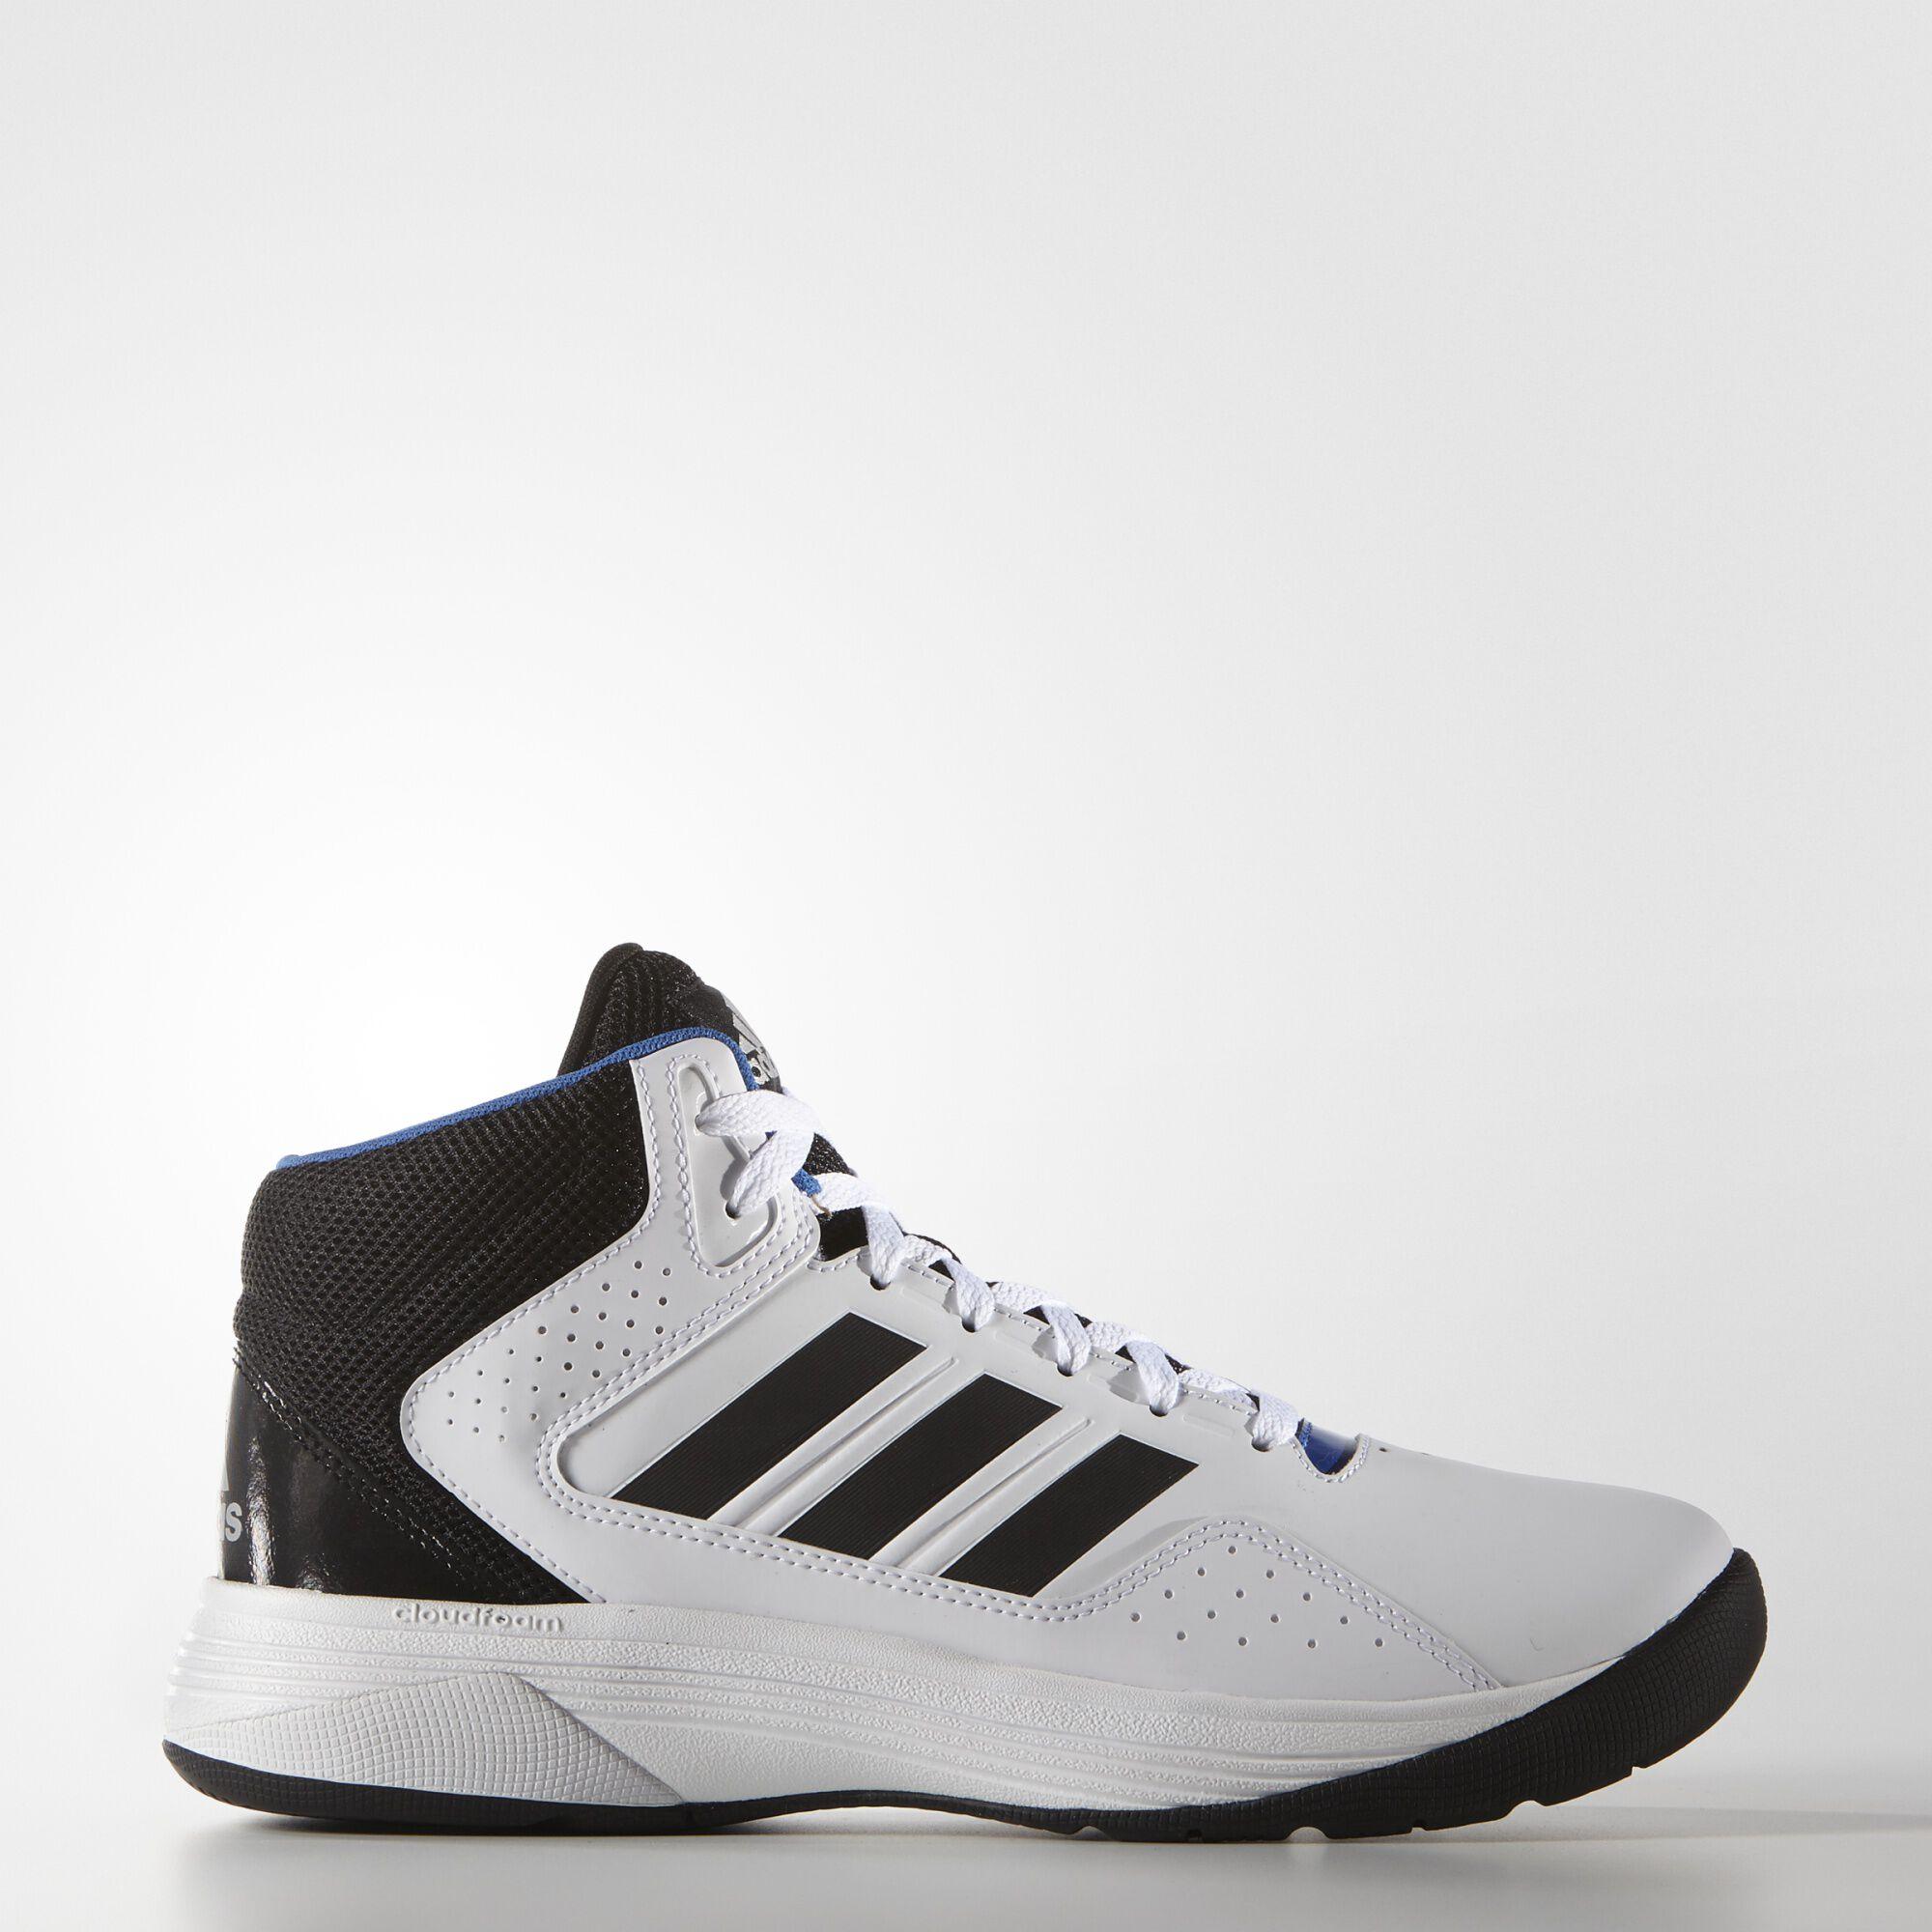 Adidas Neo Men